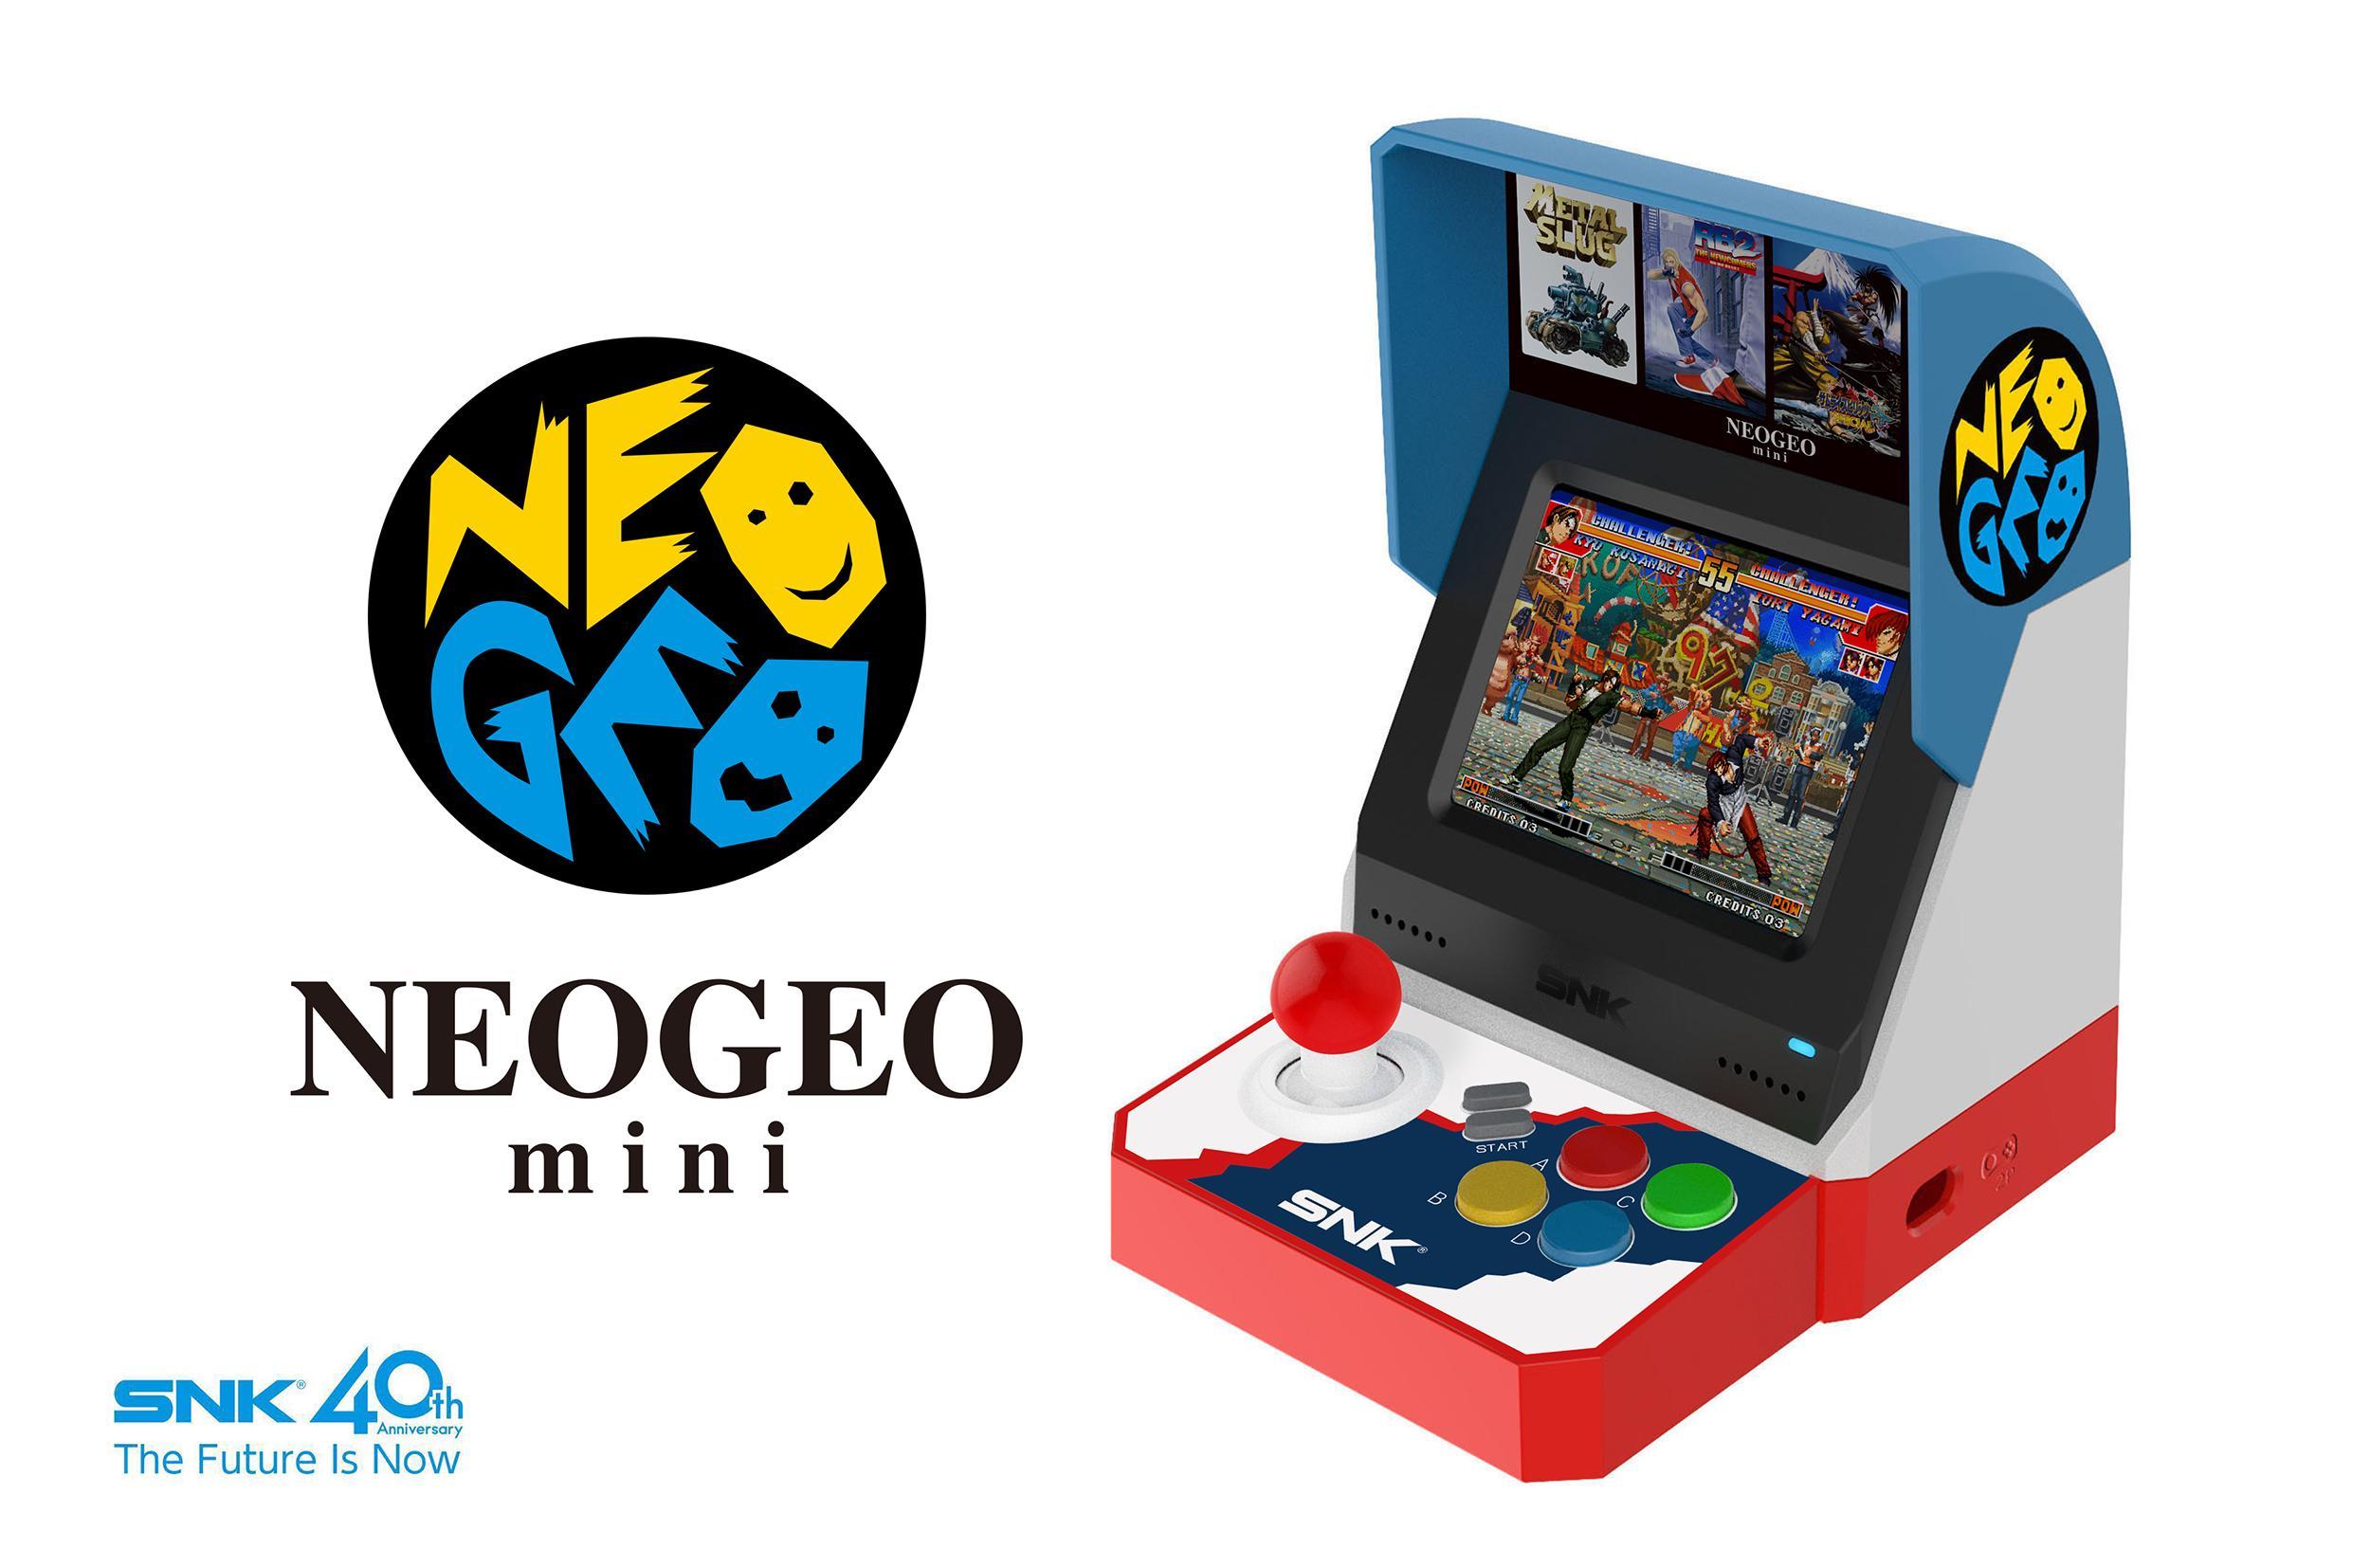 La petite borne nostalgique de SNK — Neo Geo Mini